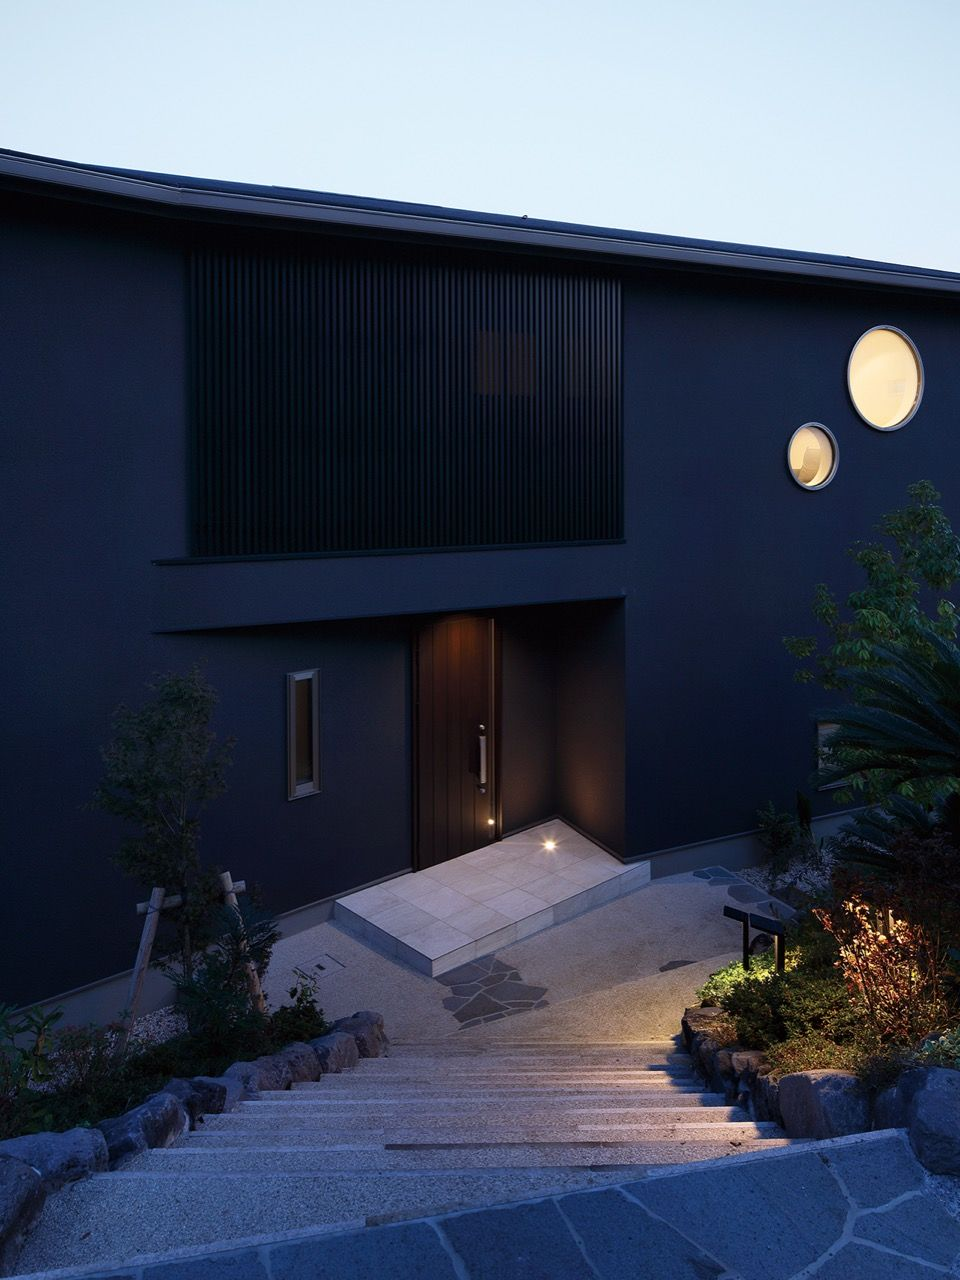 Works 015 プールのある別荘 建築デザイン室 木造注文住宅の住友林業